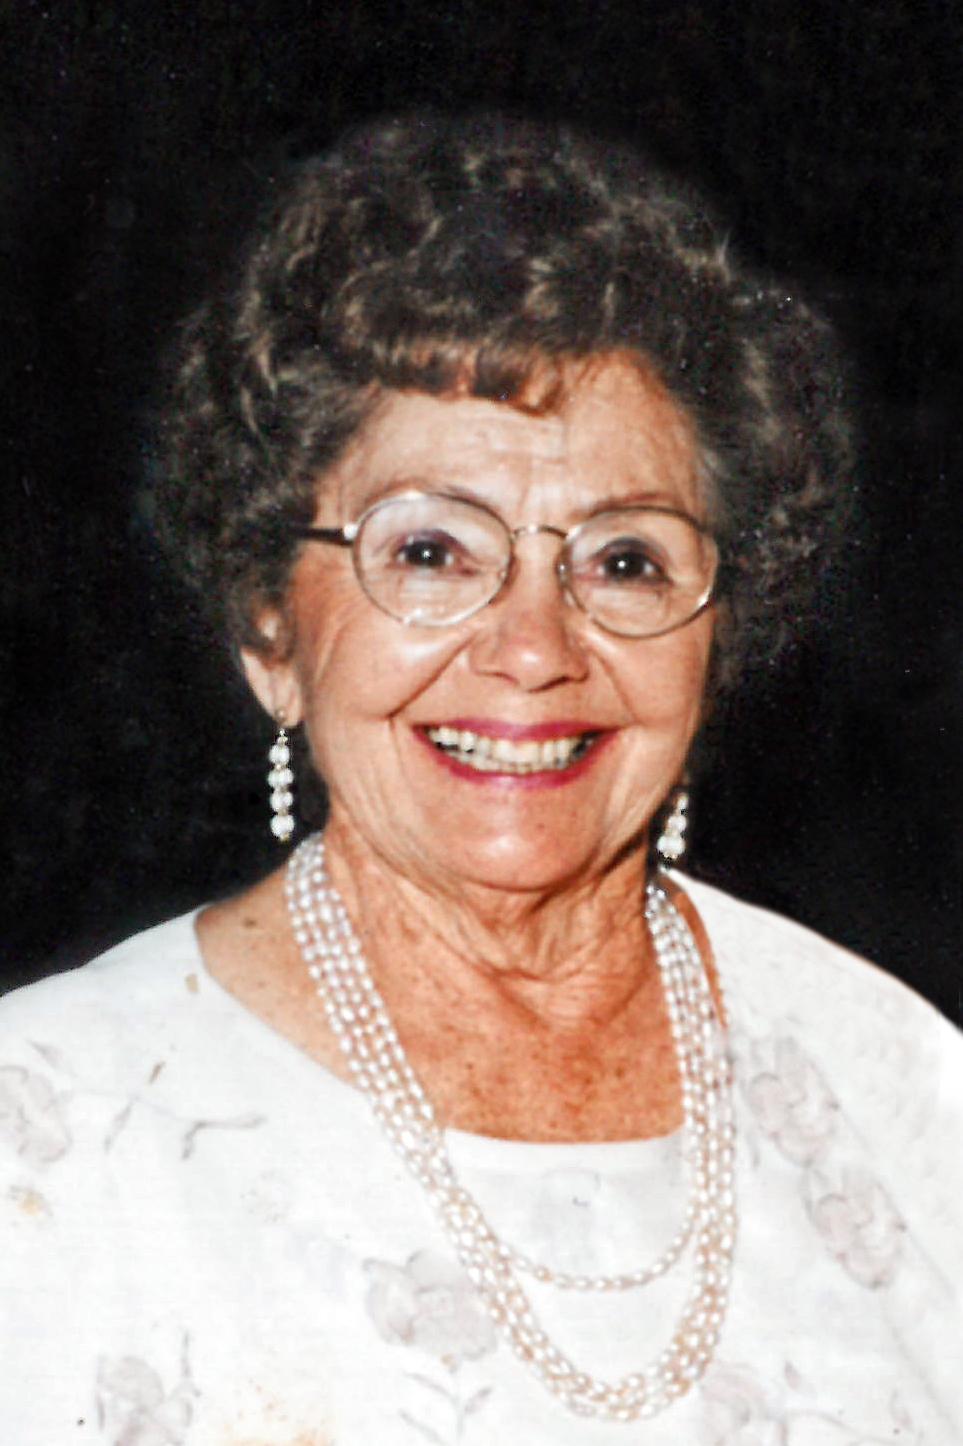 Gina Kozial